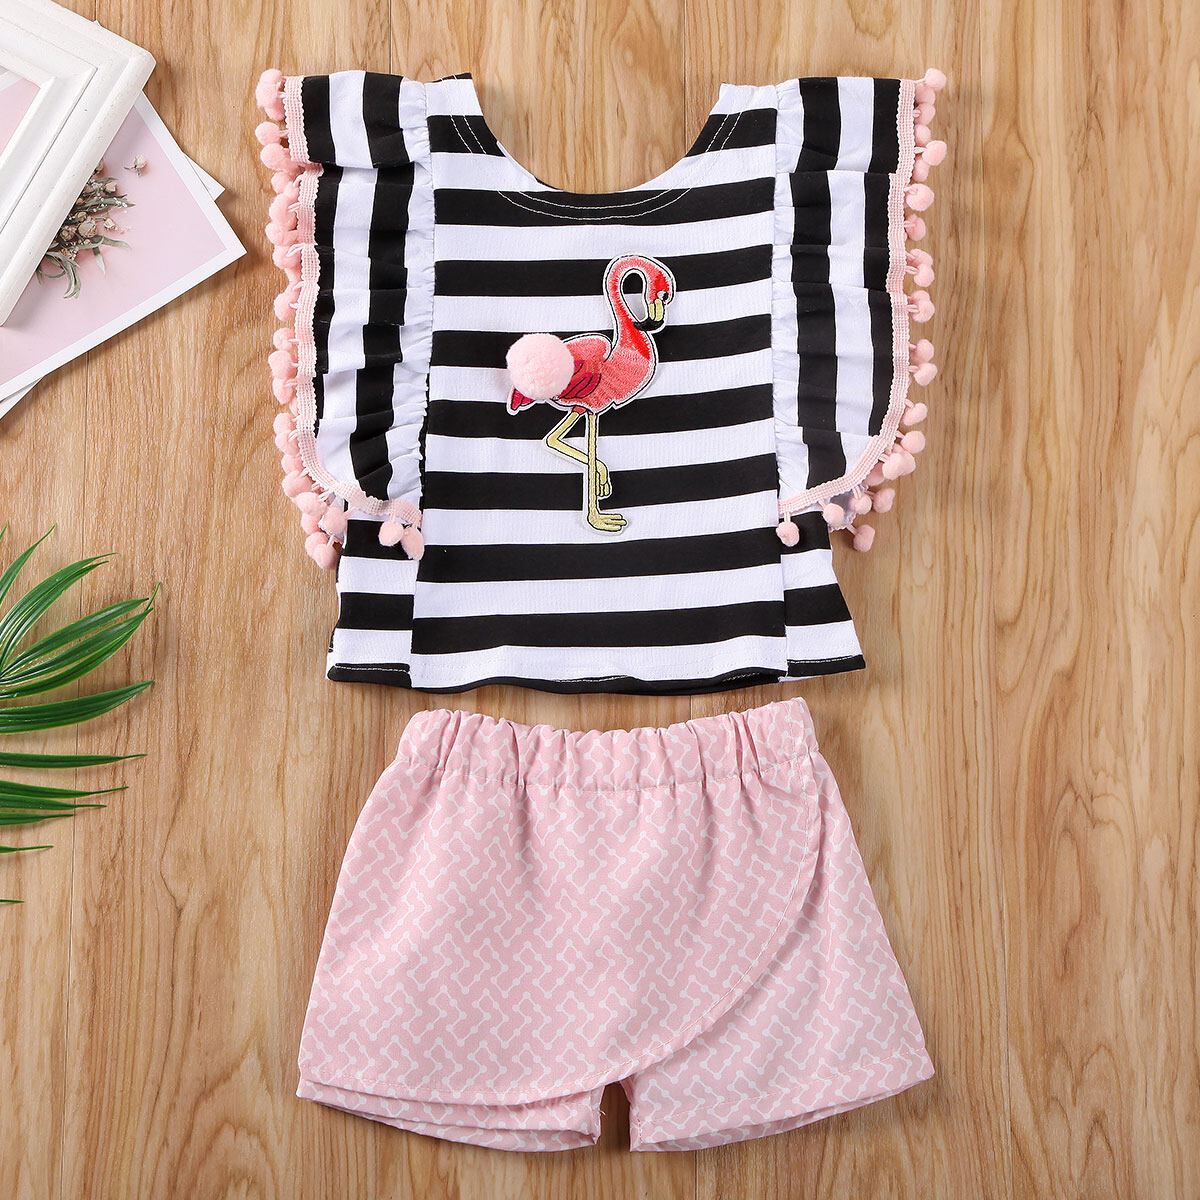 2PCS Summer Toddler Kids Baby Girls Outfits Flamingos Tops+Short Pants Clothes